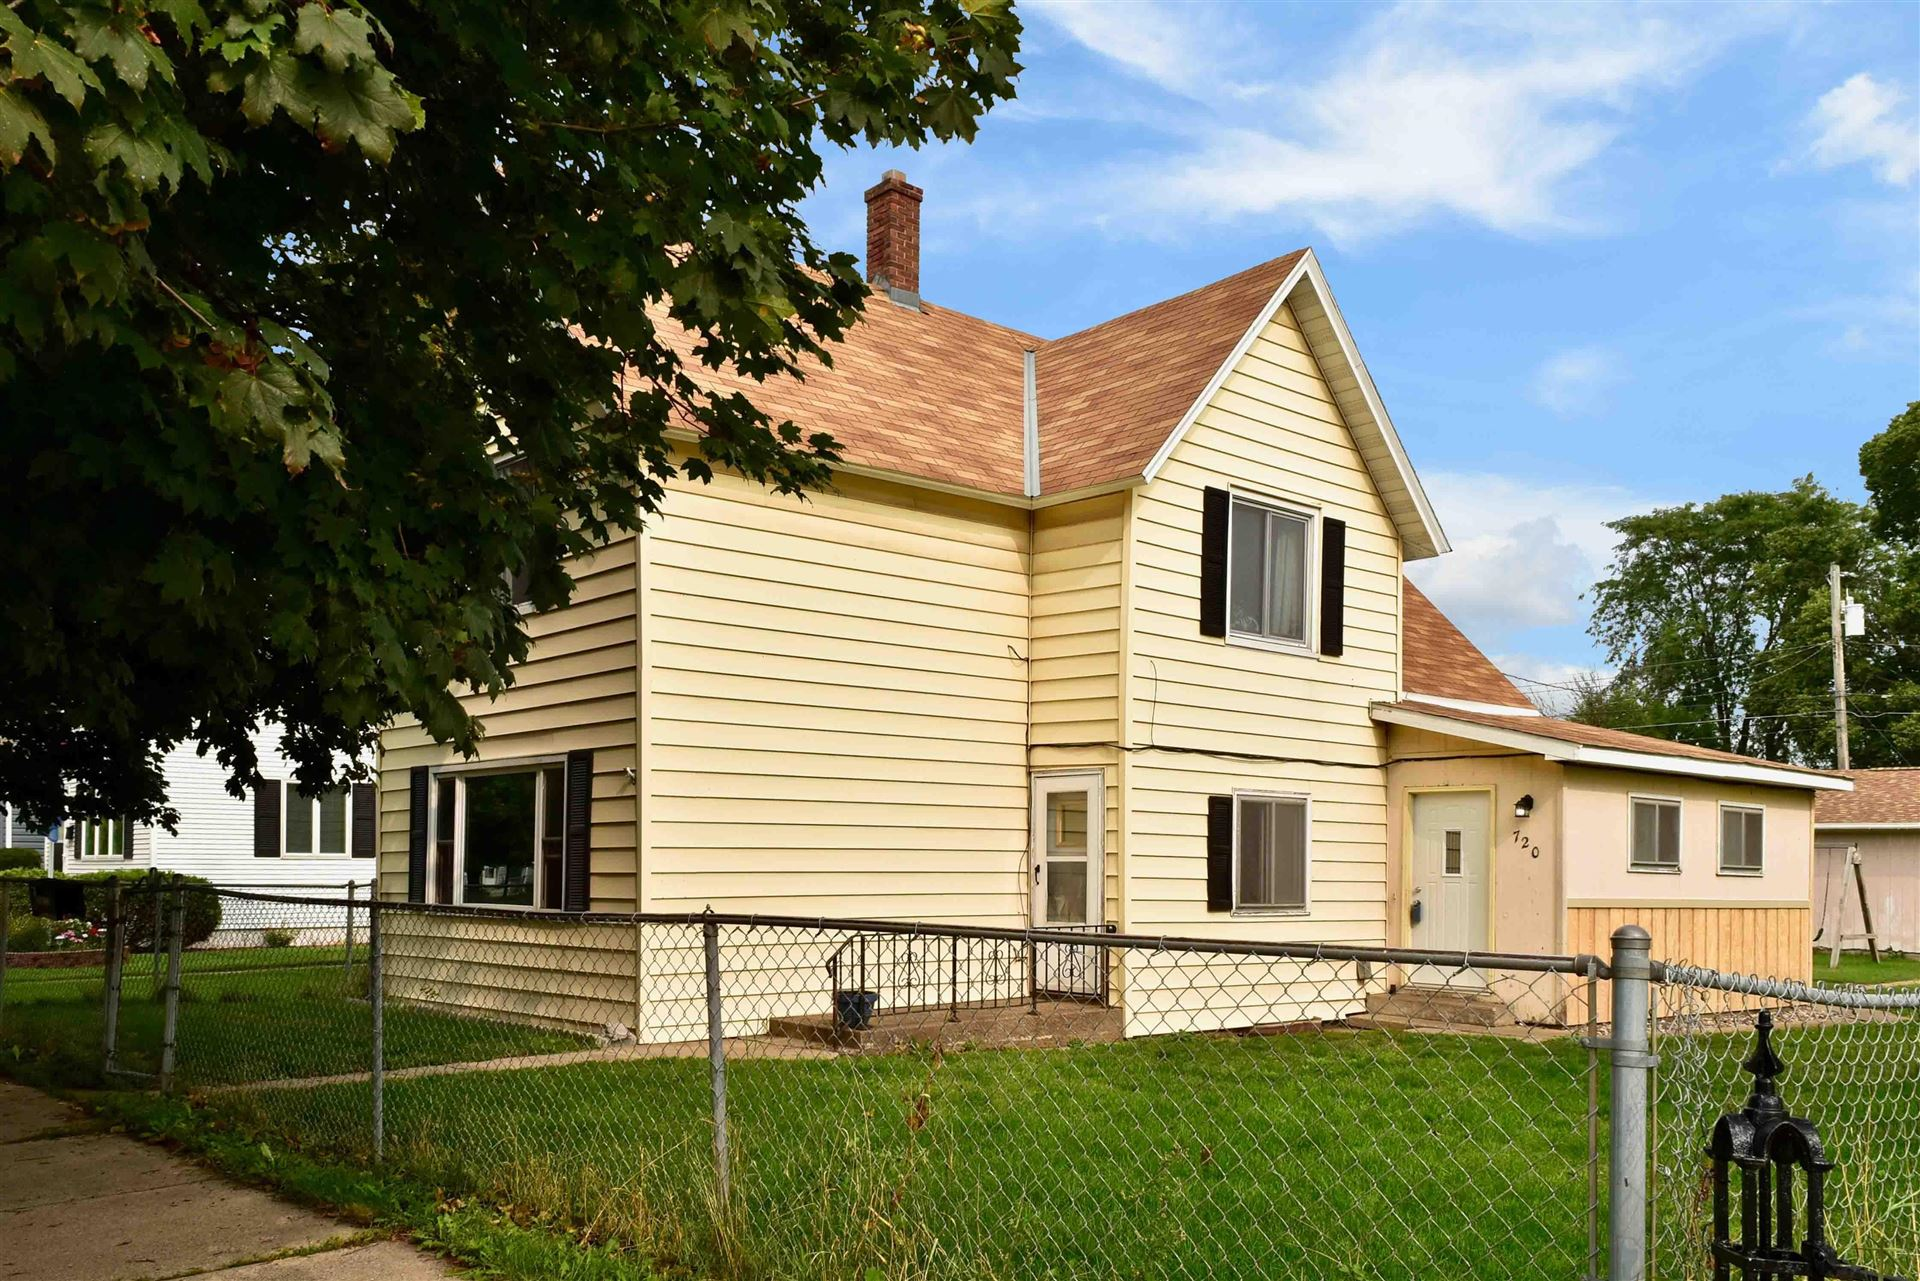 720 E 3rd Street, Winona, MN 55987 - MLS#: 5659496